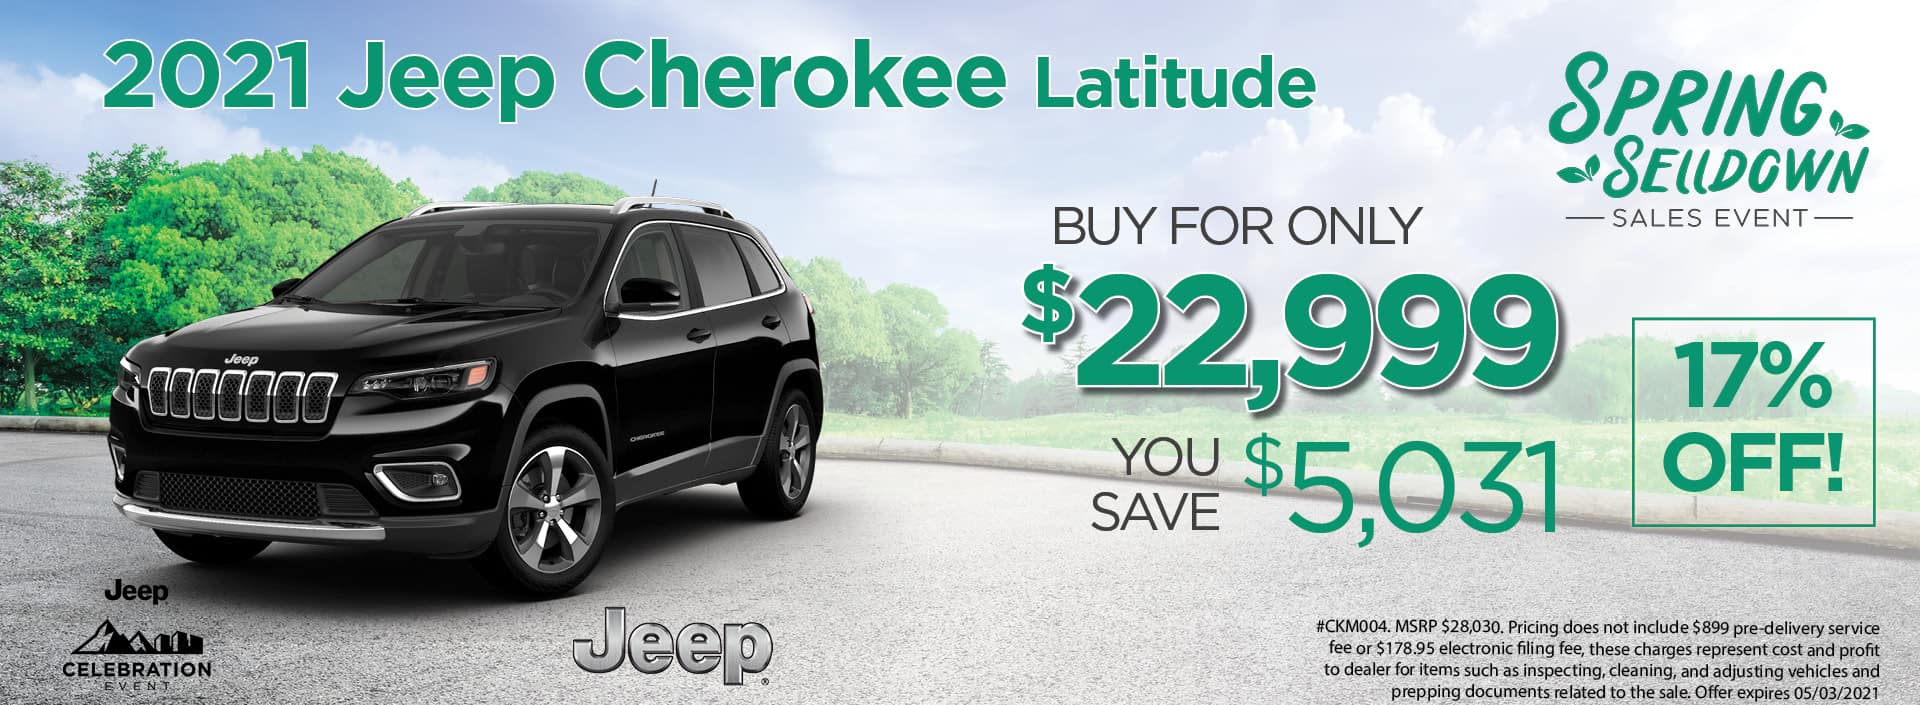 21 Cherokee 22999